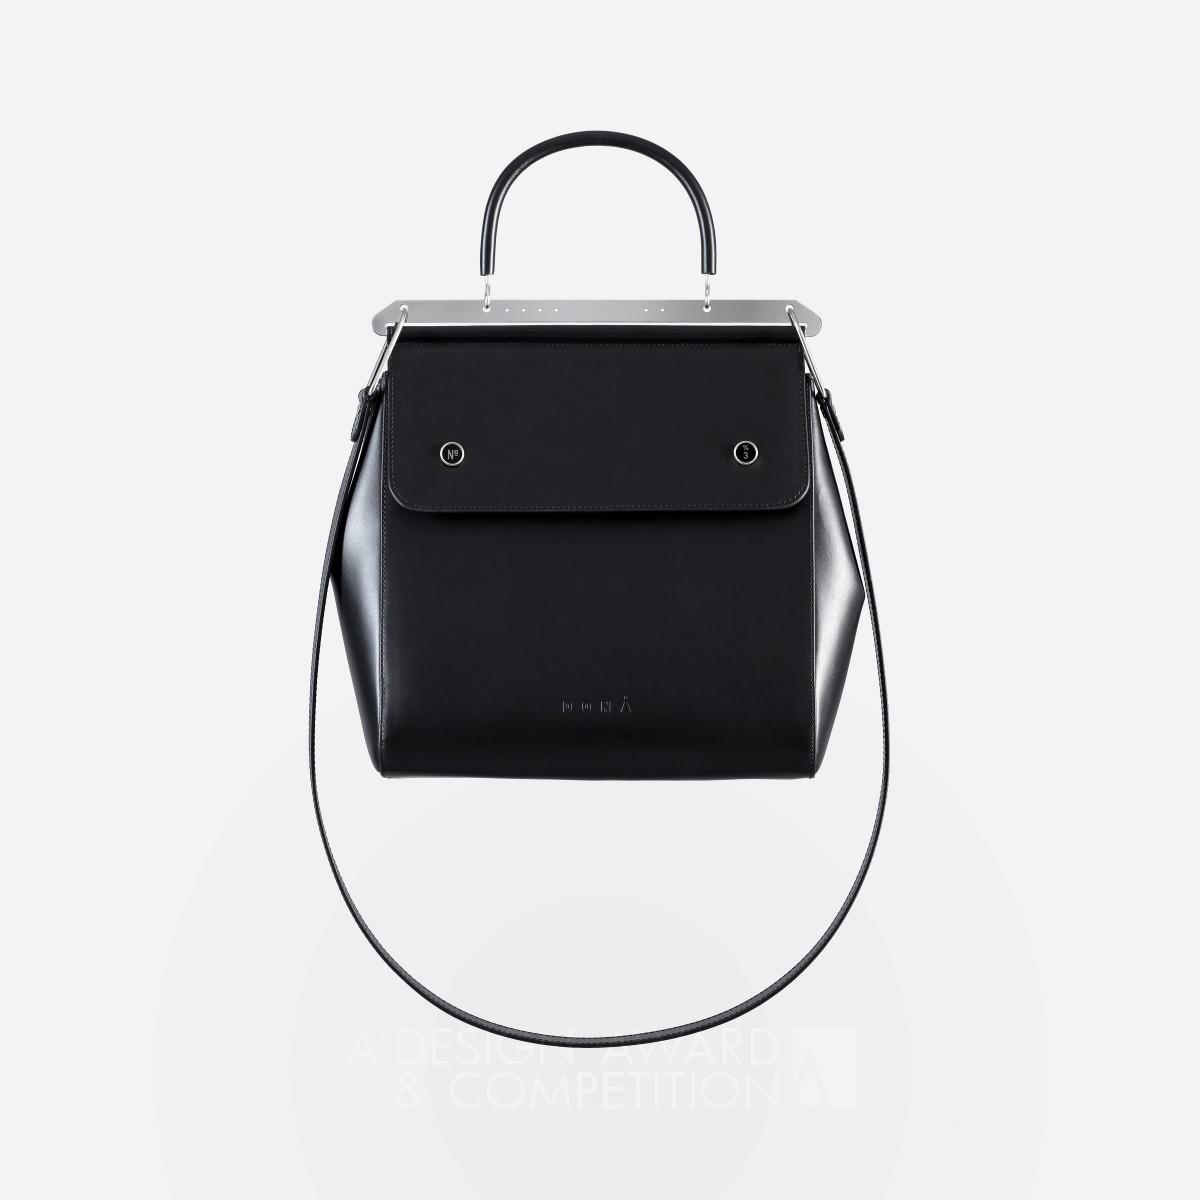 Qwerty Elemental Handbags